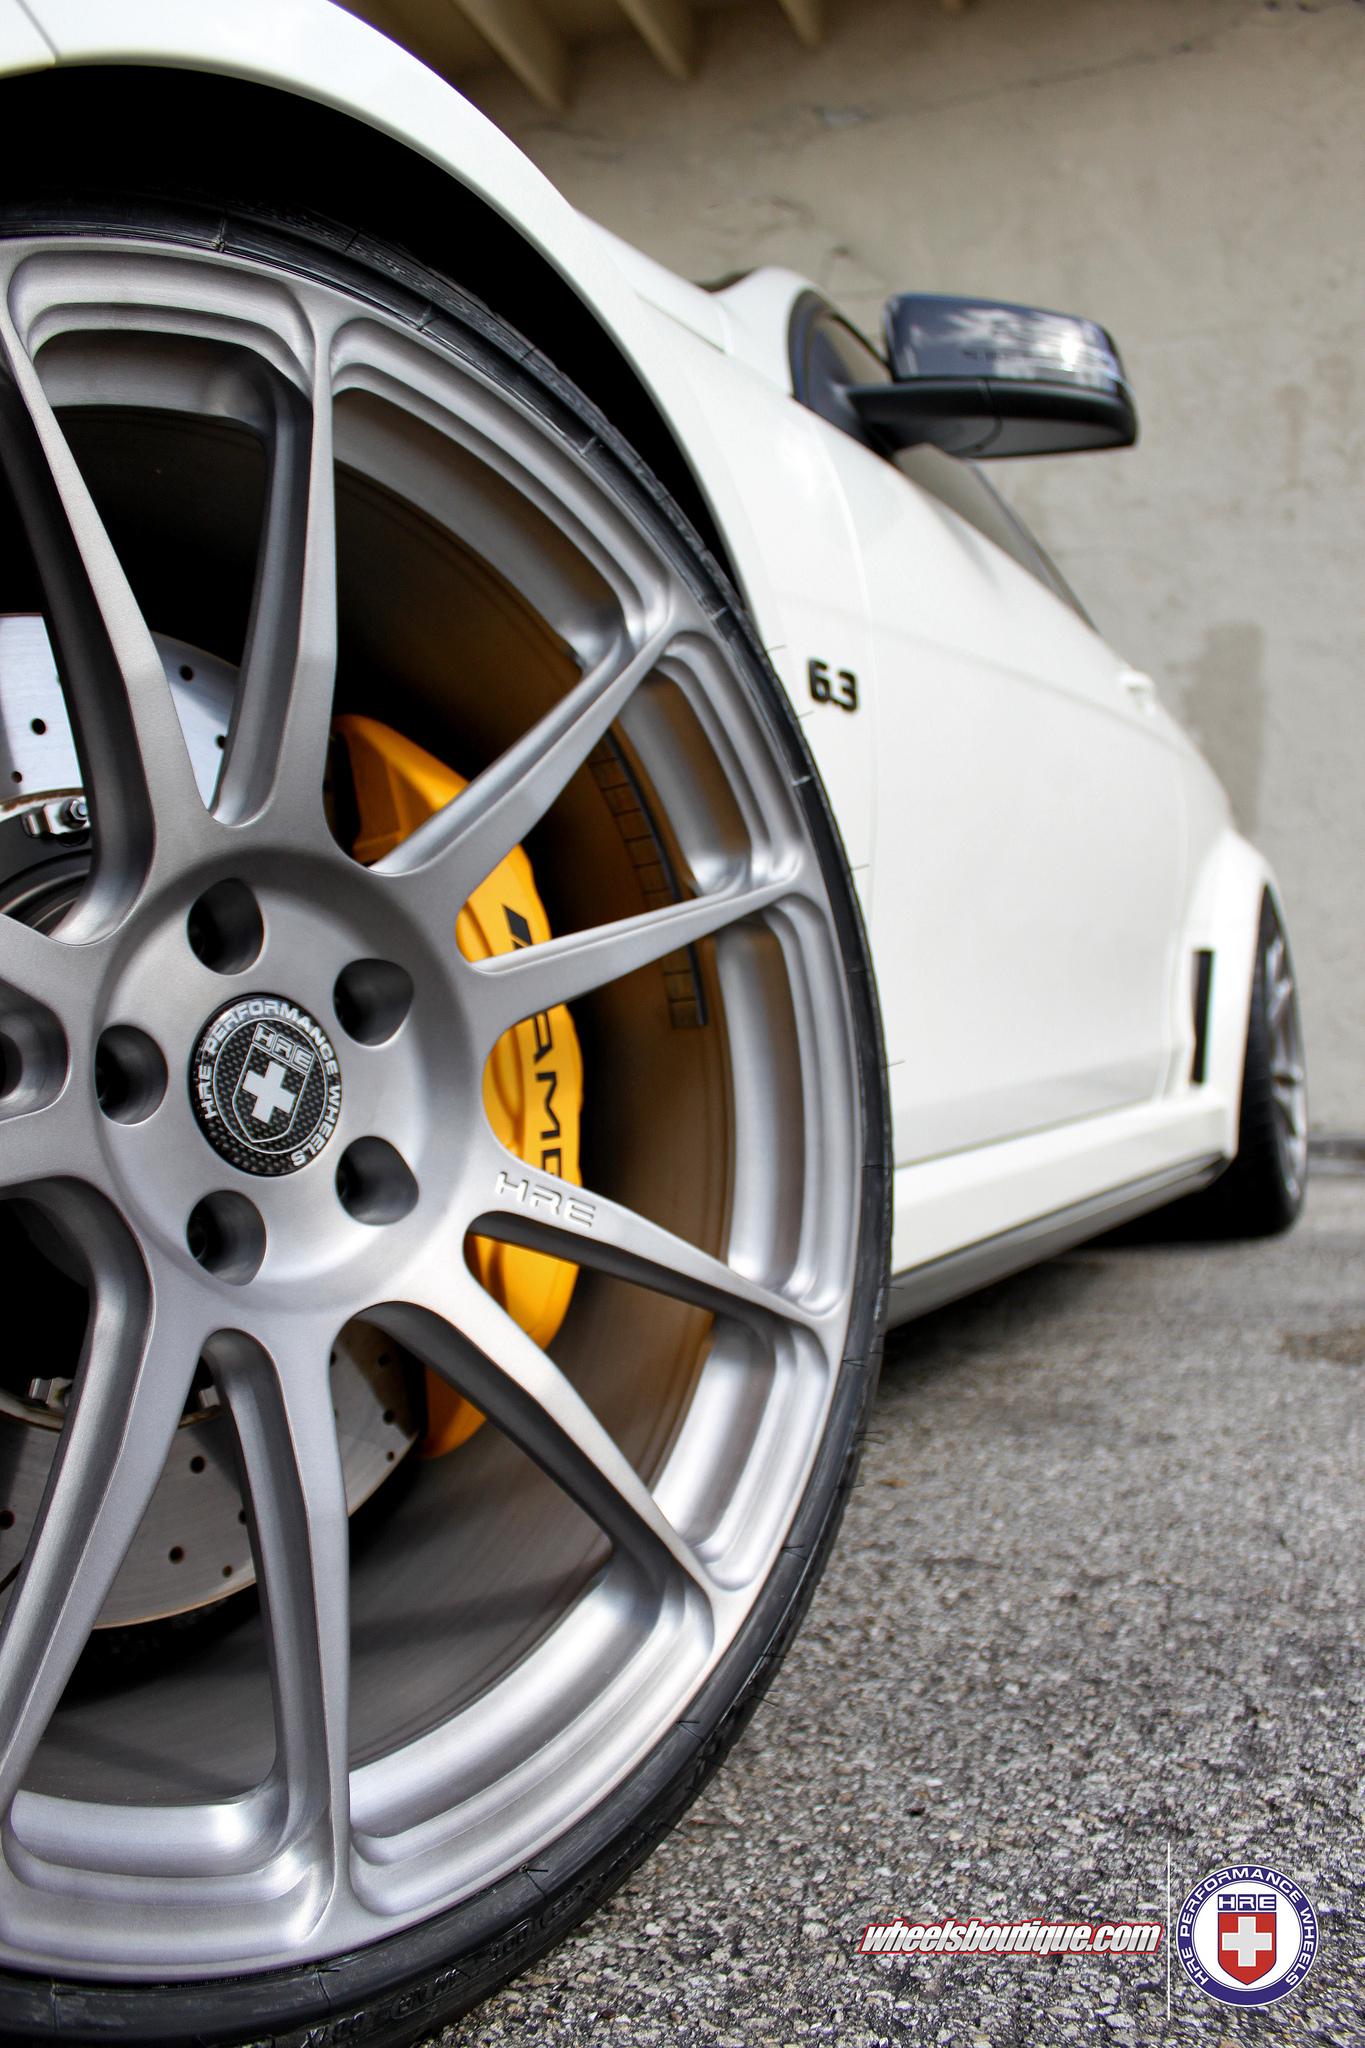 Chevy Volt Body Kit >> Mercedes Tuning: Wheels Boutique & HRE tweaked C63 AMG Black